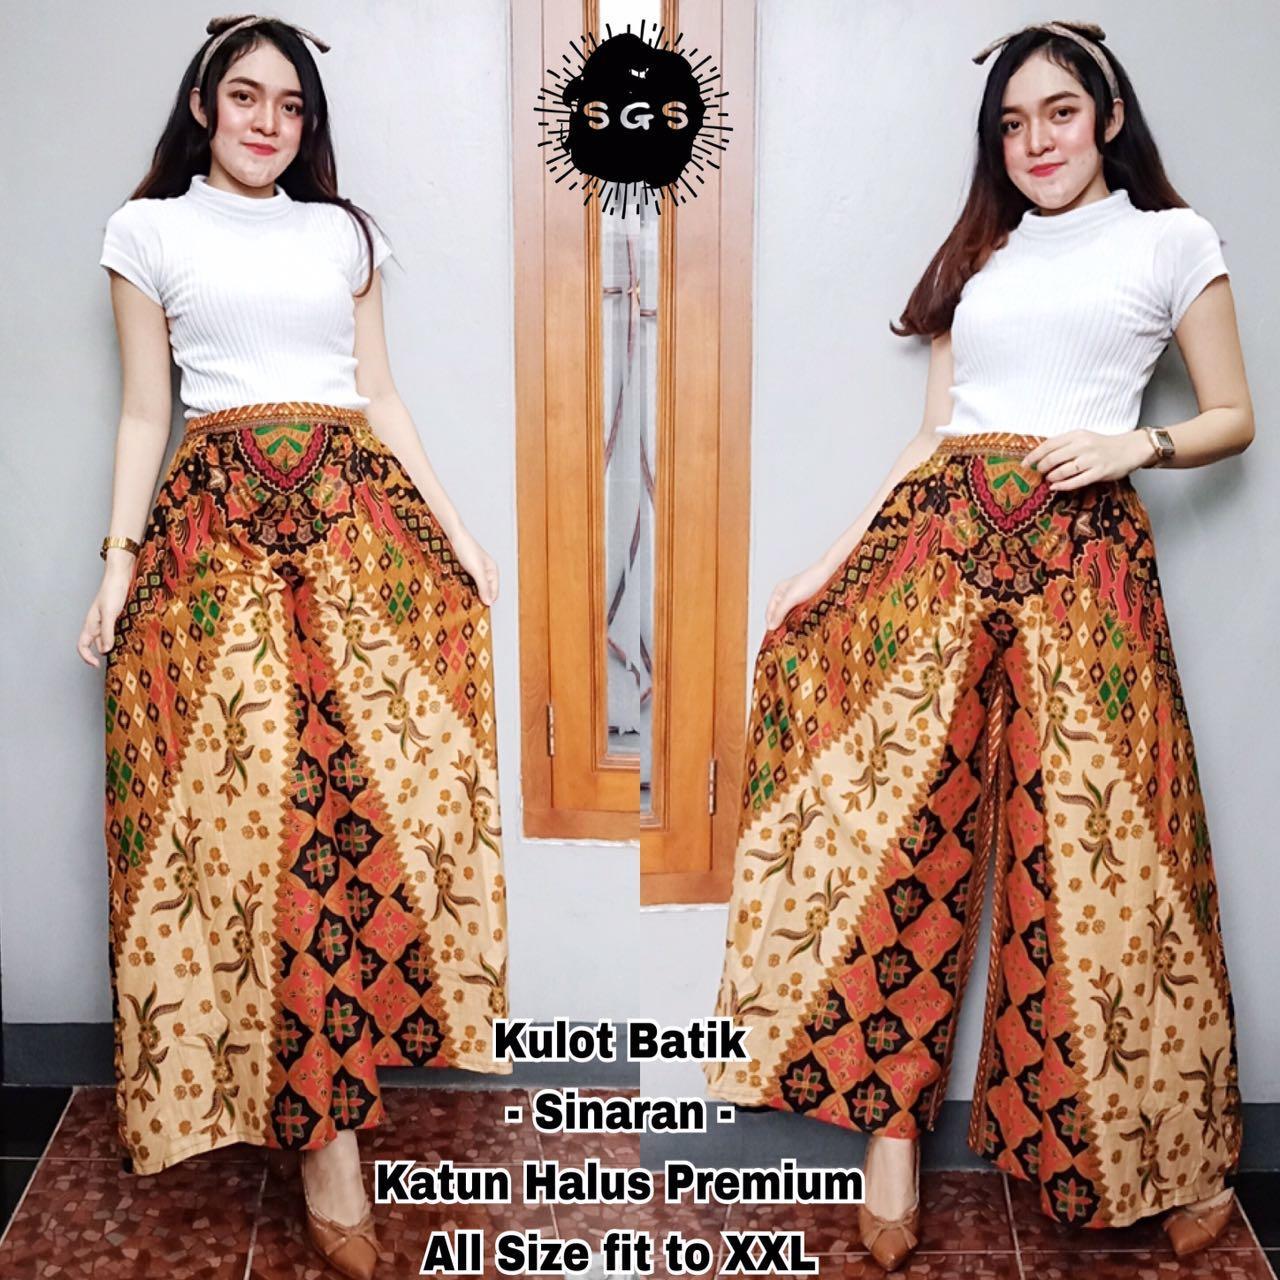 Bawahan Celana Panjang Kulot - Celana Kulot Batik - Celana Jogger Wanita -  Kulot Sinaran  ce2c6845a7